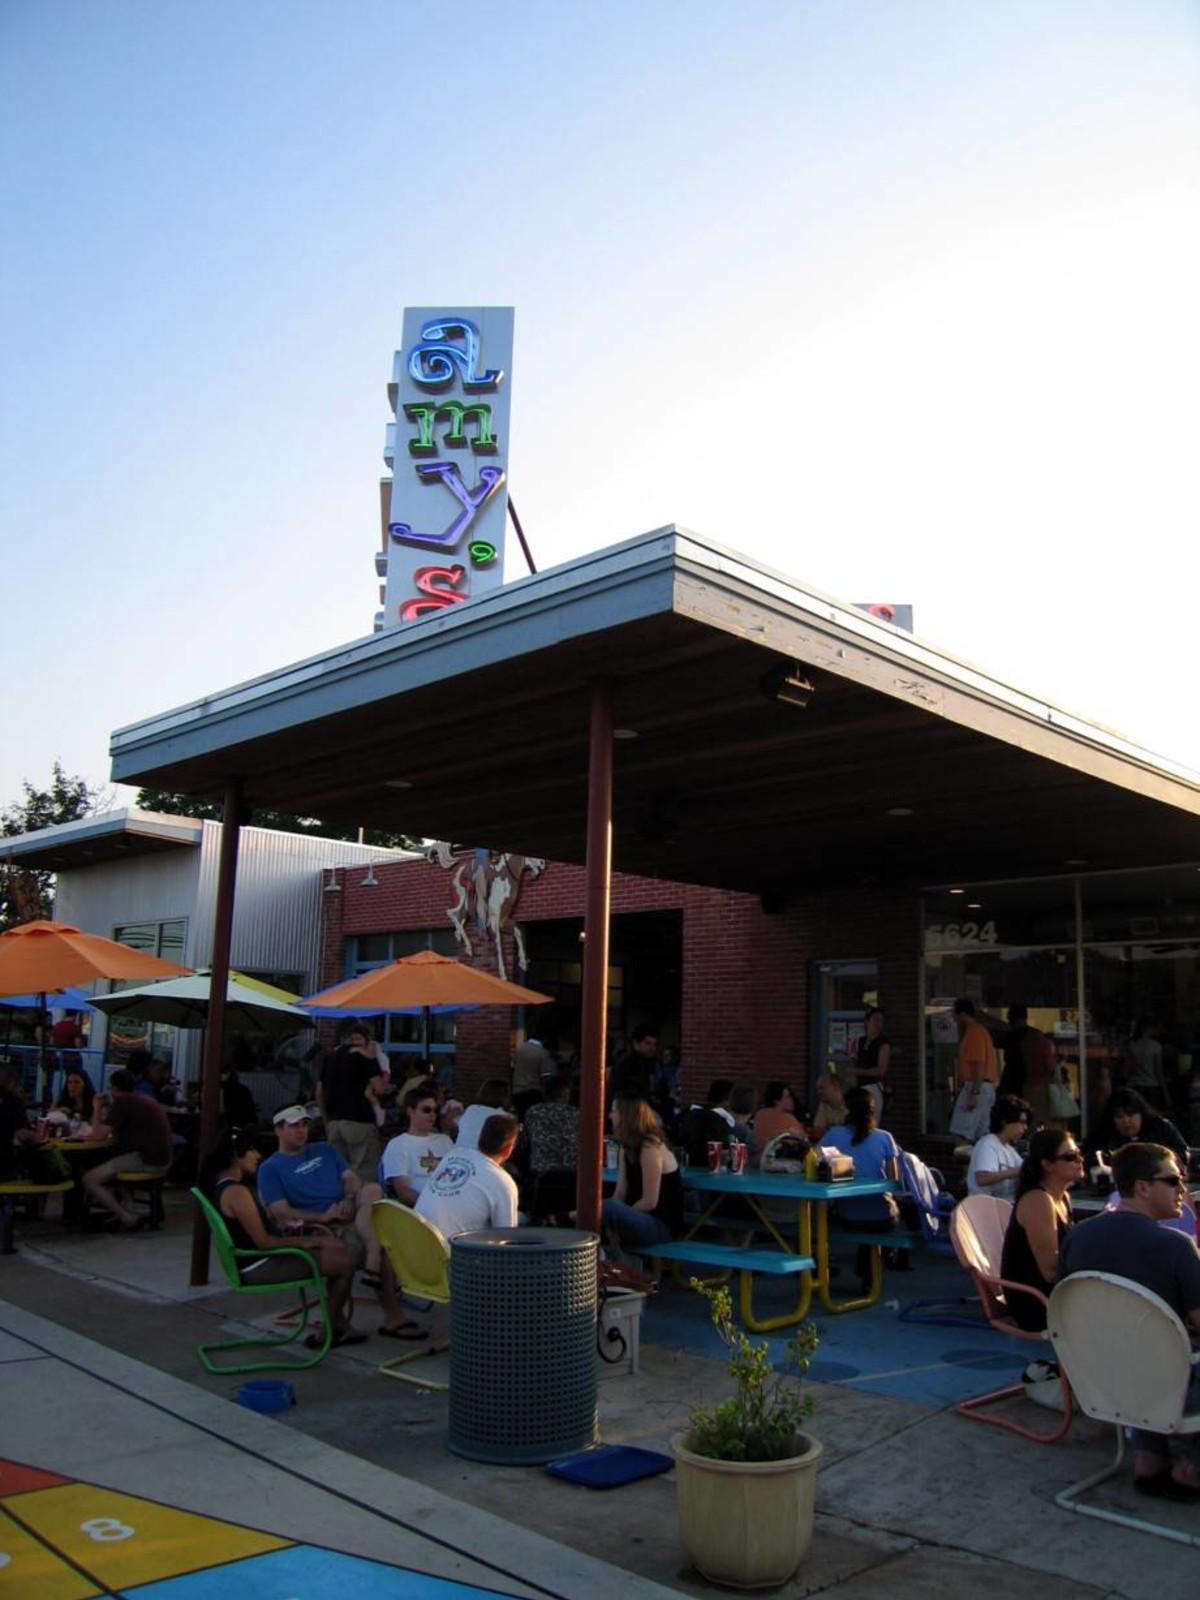 Austin_photo: places_food_amys_ice_cream_exterior